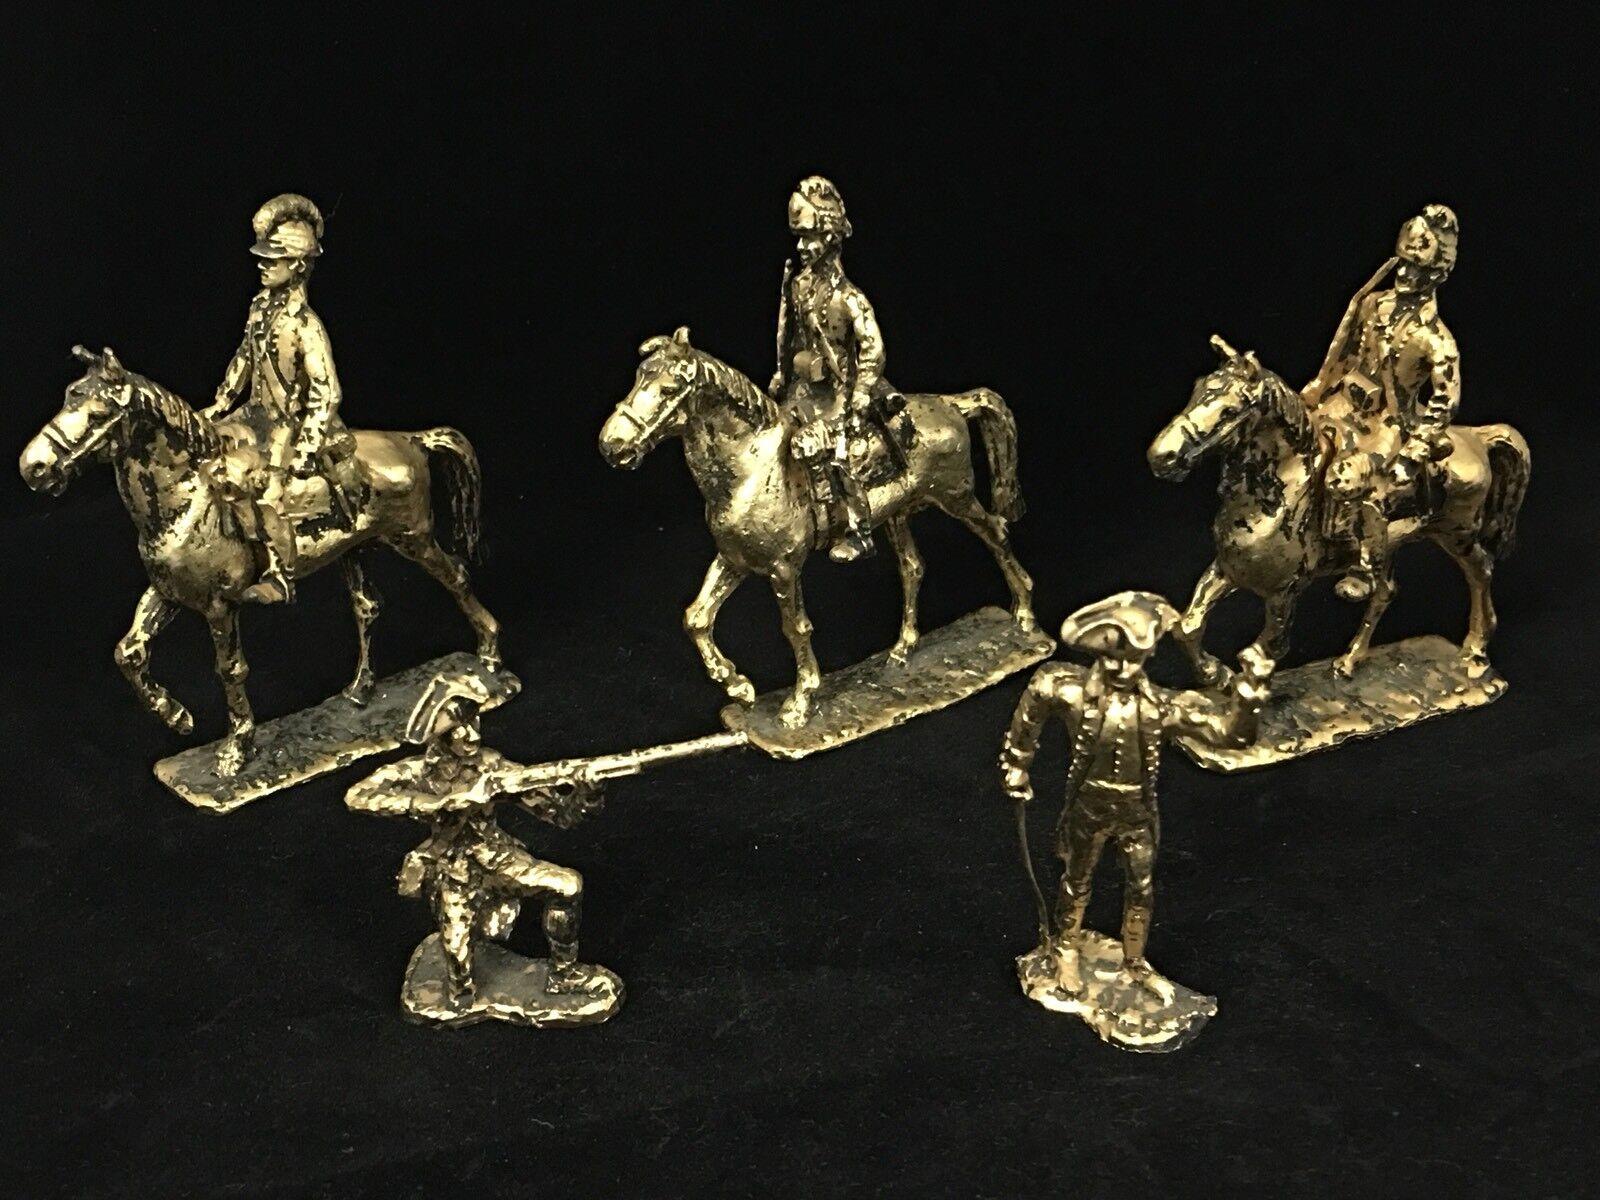 5. jahrgang Gold tone metall revolutionskrieg spielzeugsoldaten abnehmbaren kavallerie